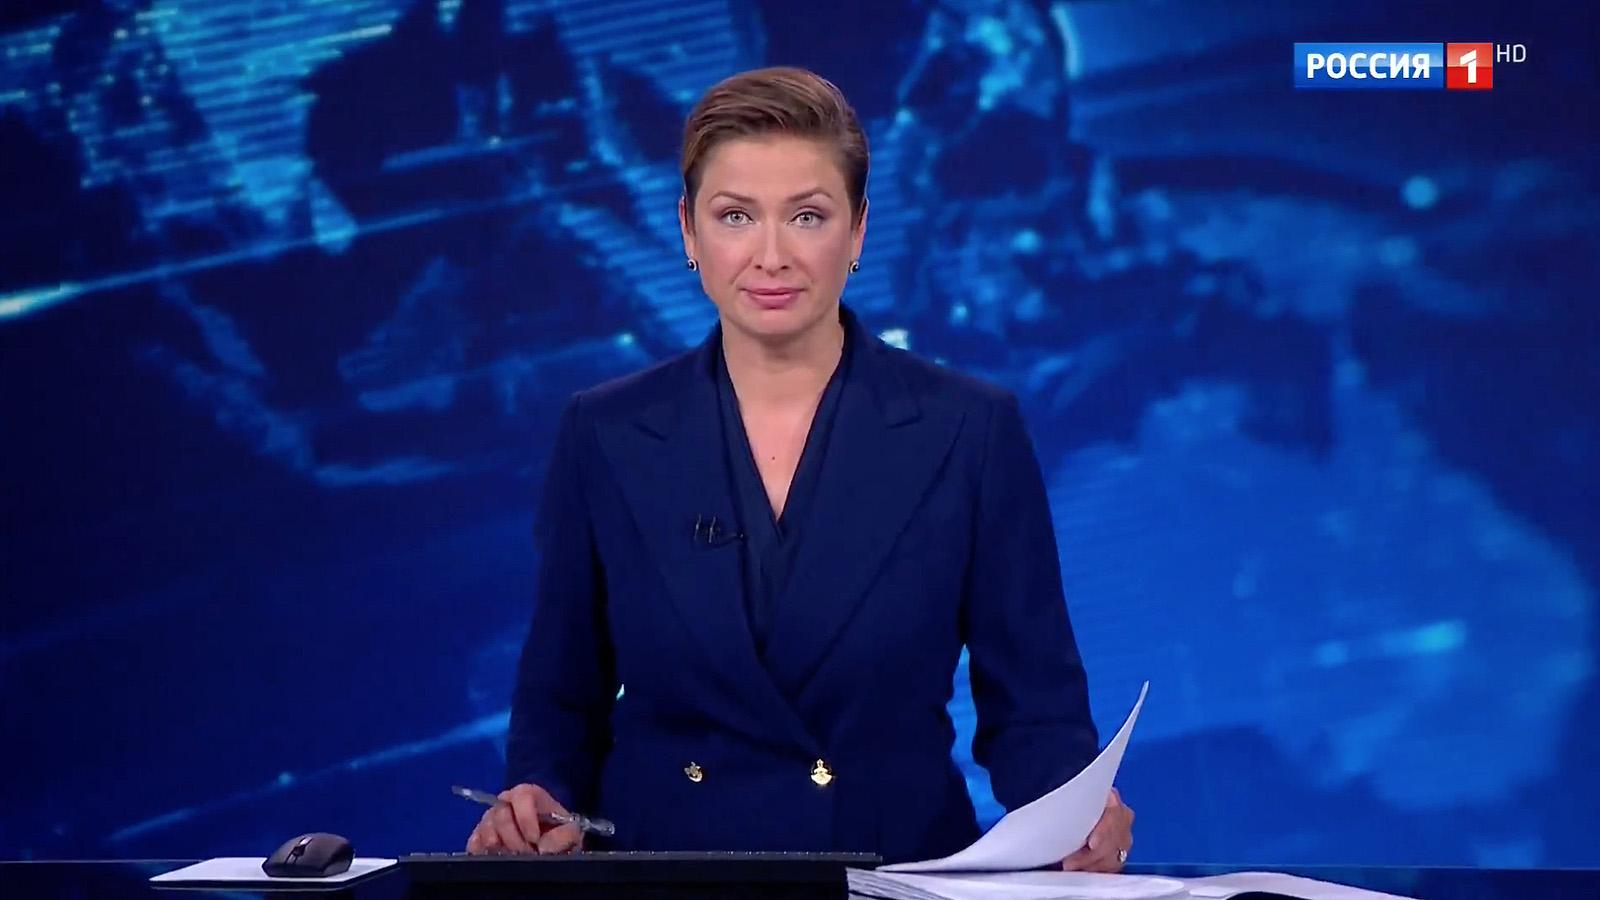 NCS_Russia-1-Vesti-Studio_0006